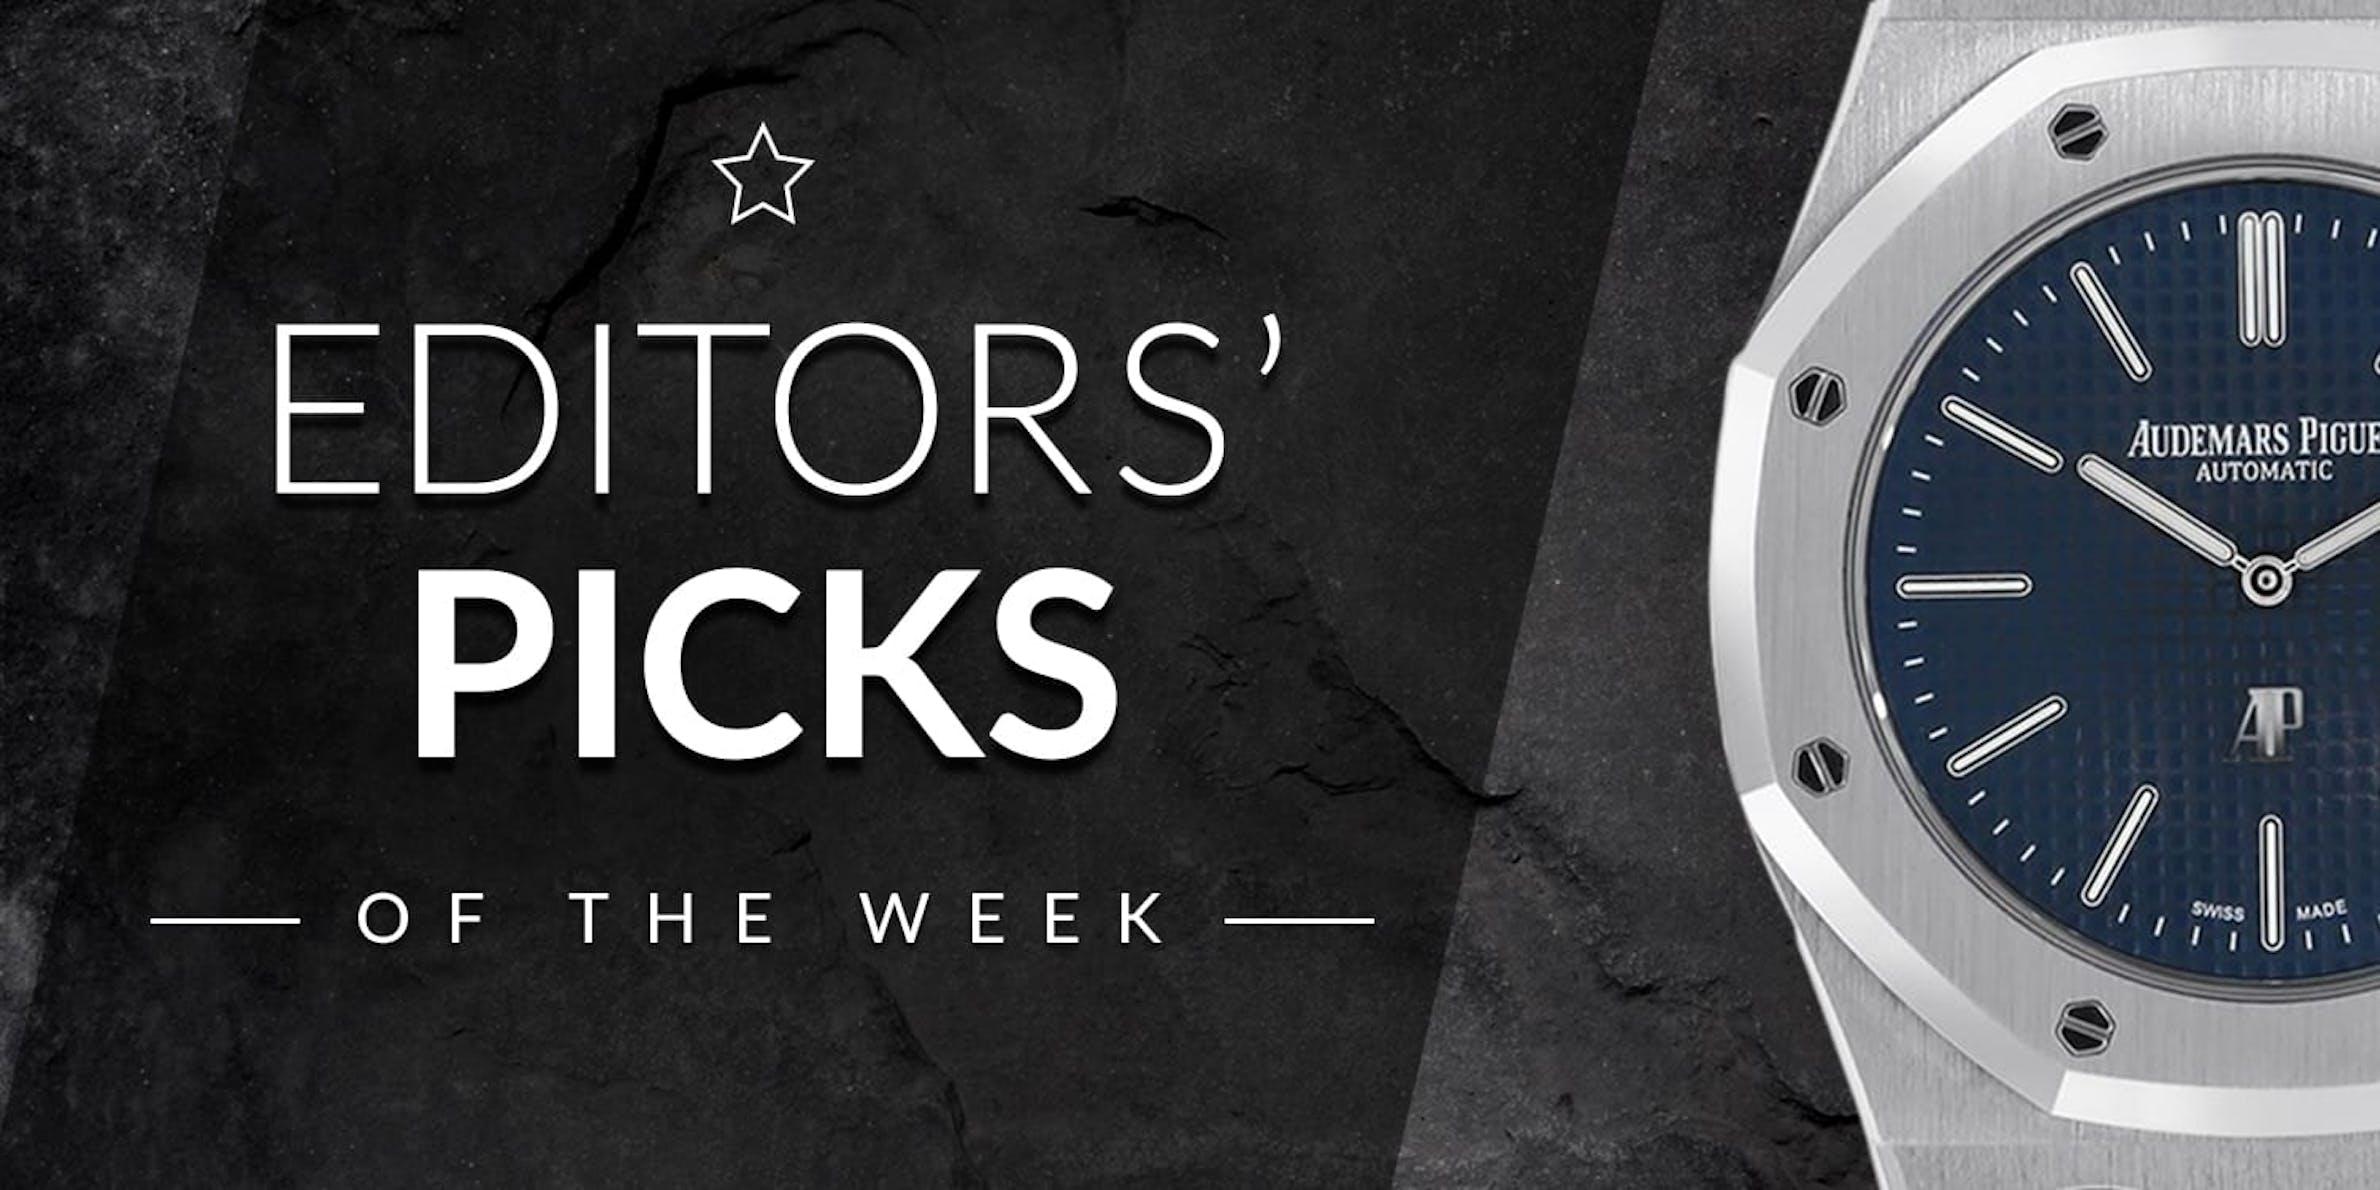 Editors' Picks of the Week: IWC, Audemars Piguet, and Omega